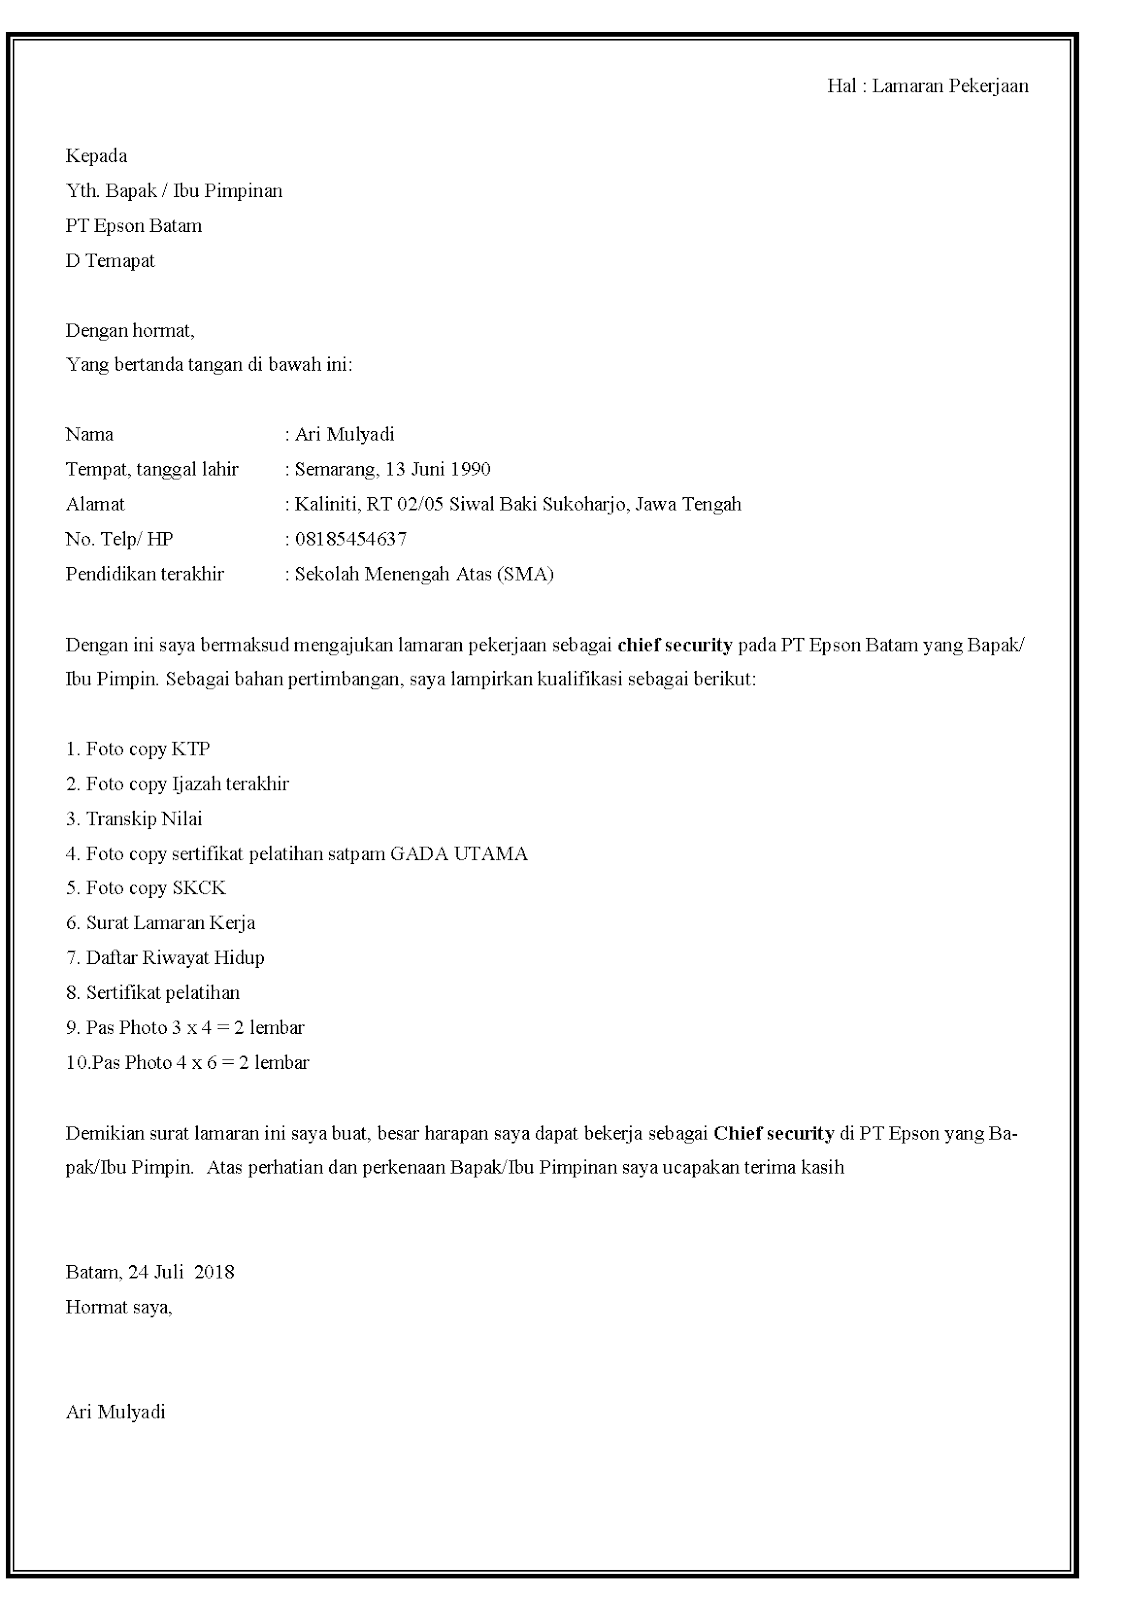 Contoh Surat Pengalaman Kerja Security